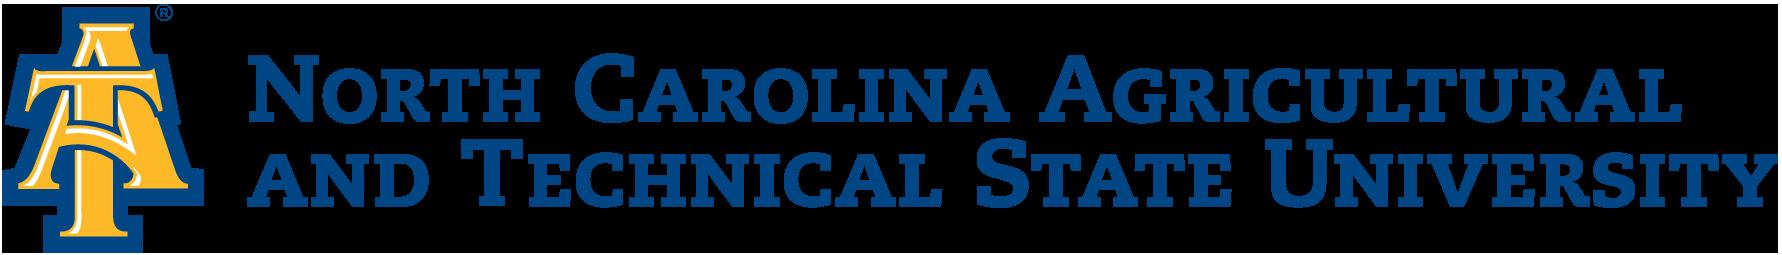 North Carolina A&T State University.